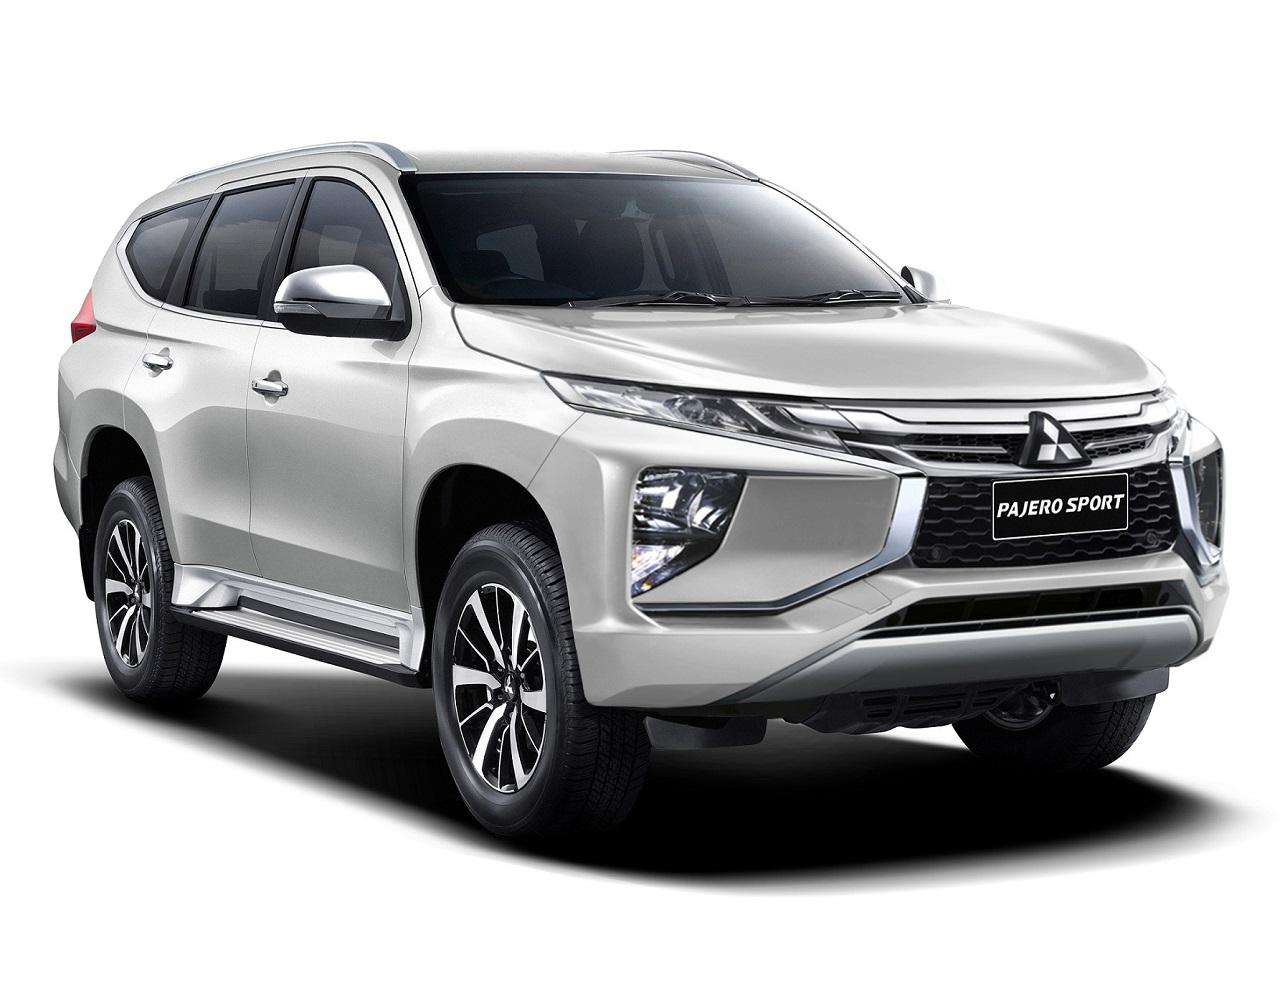 2019 Mitsubishi Pajero Sport Facelift Rendering !? ・・・・